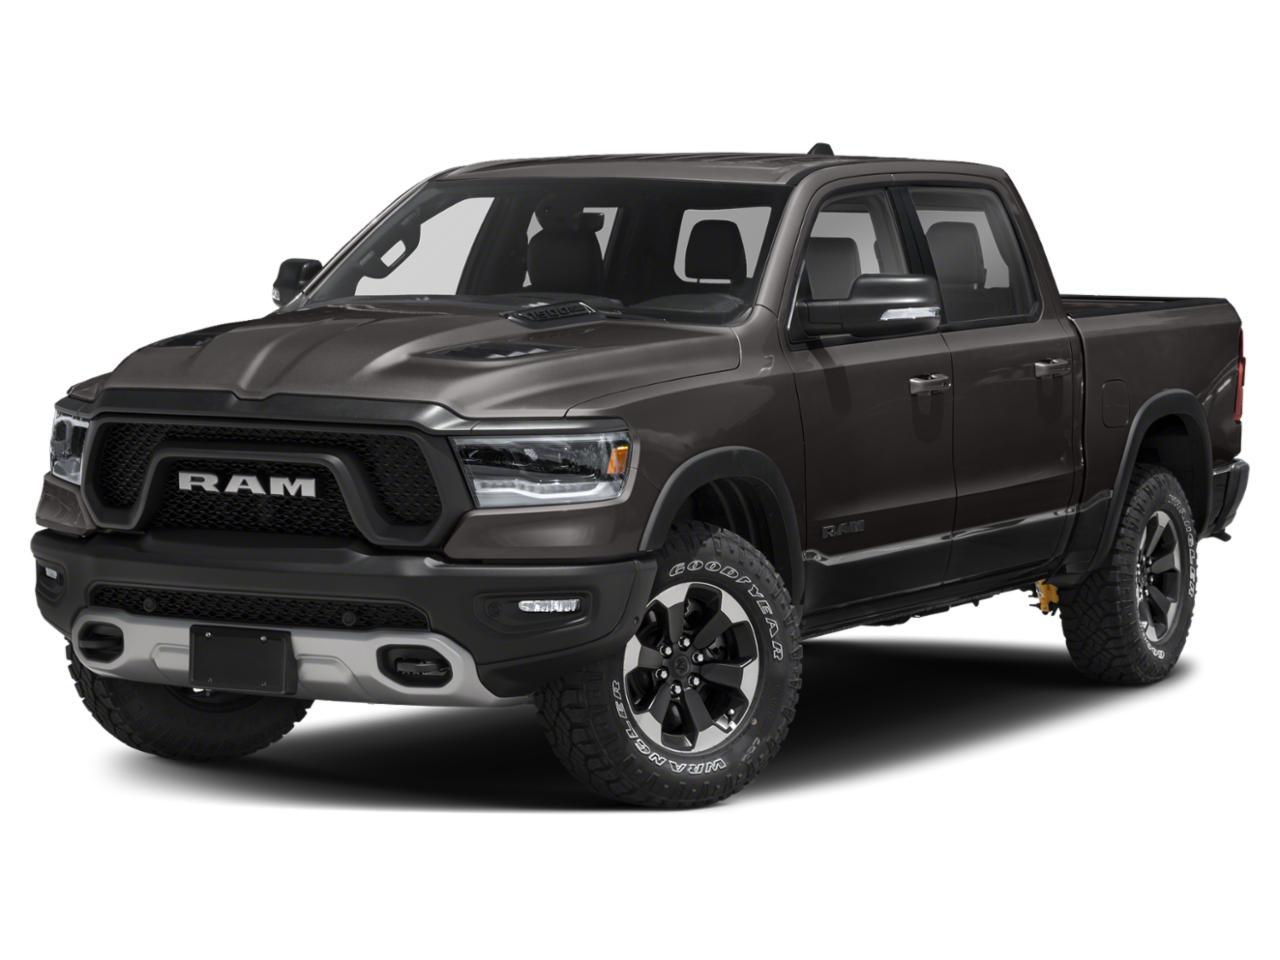 2020 Ram 1500 Vehicle Photo in Torrington, CT 06790